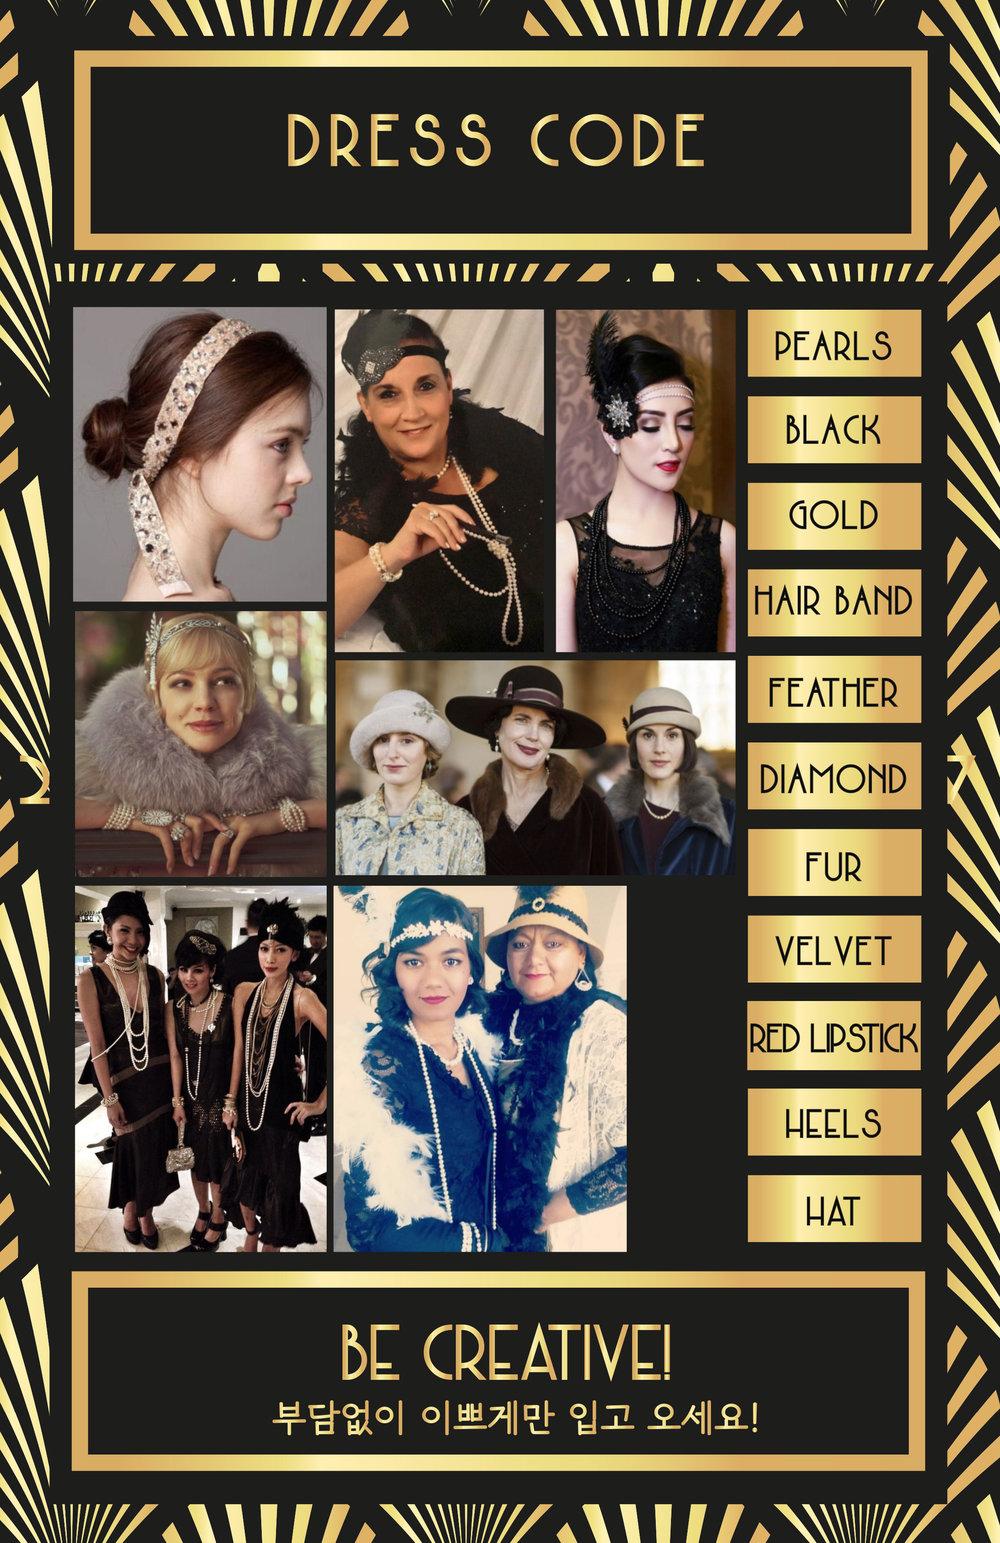 INVITATION_dresscode1710x2430.jpg